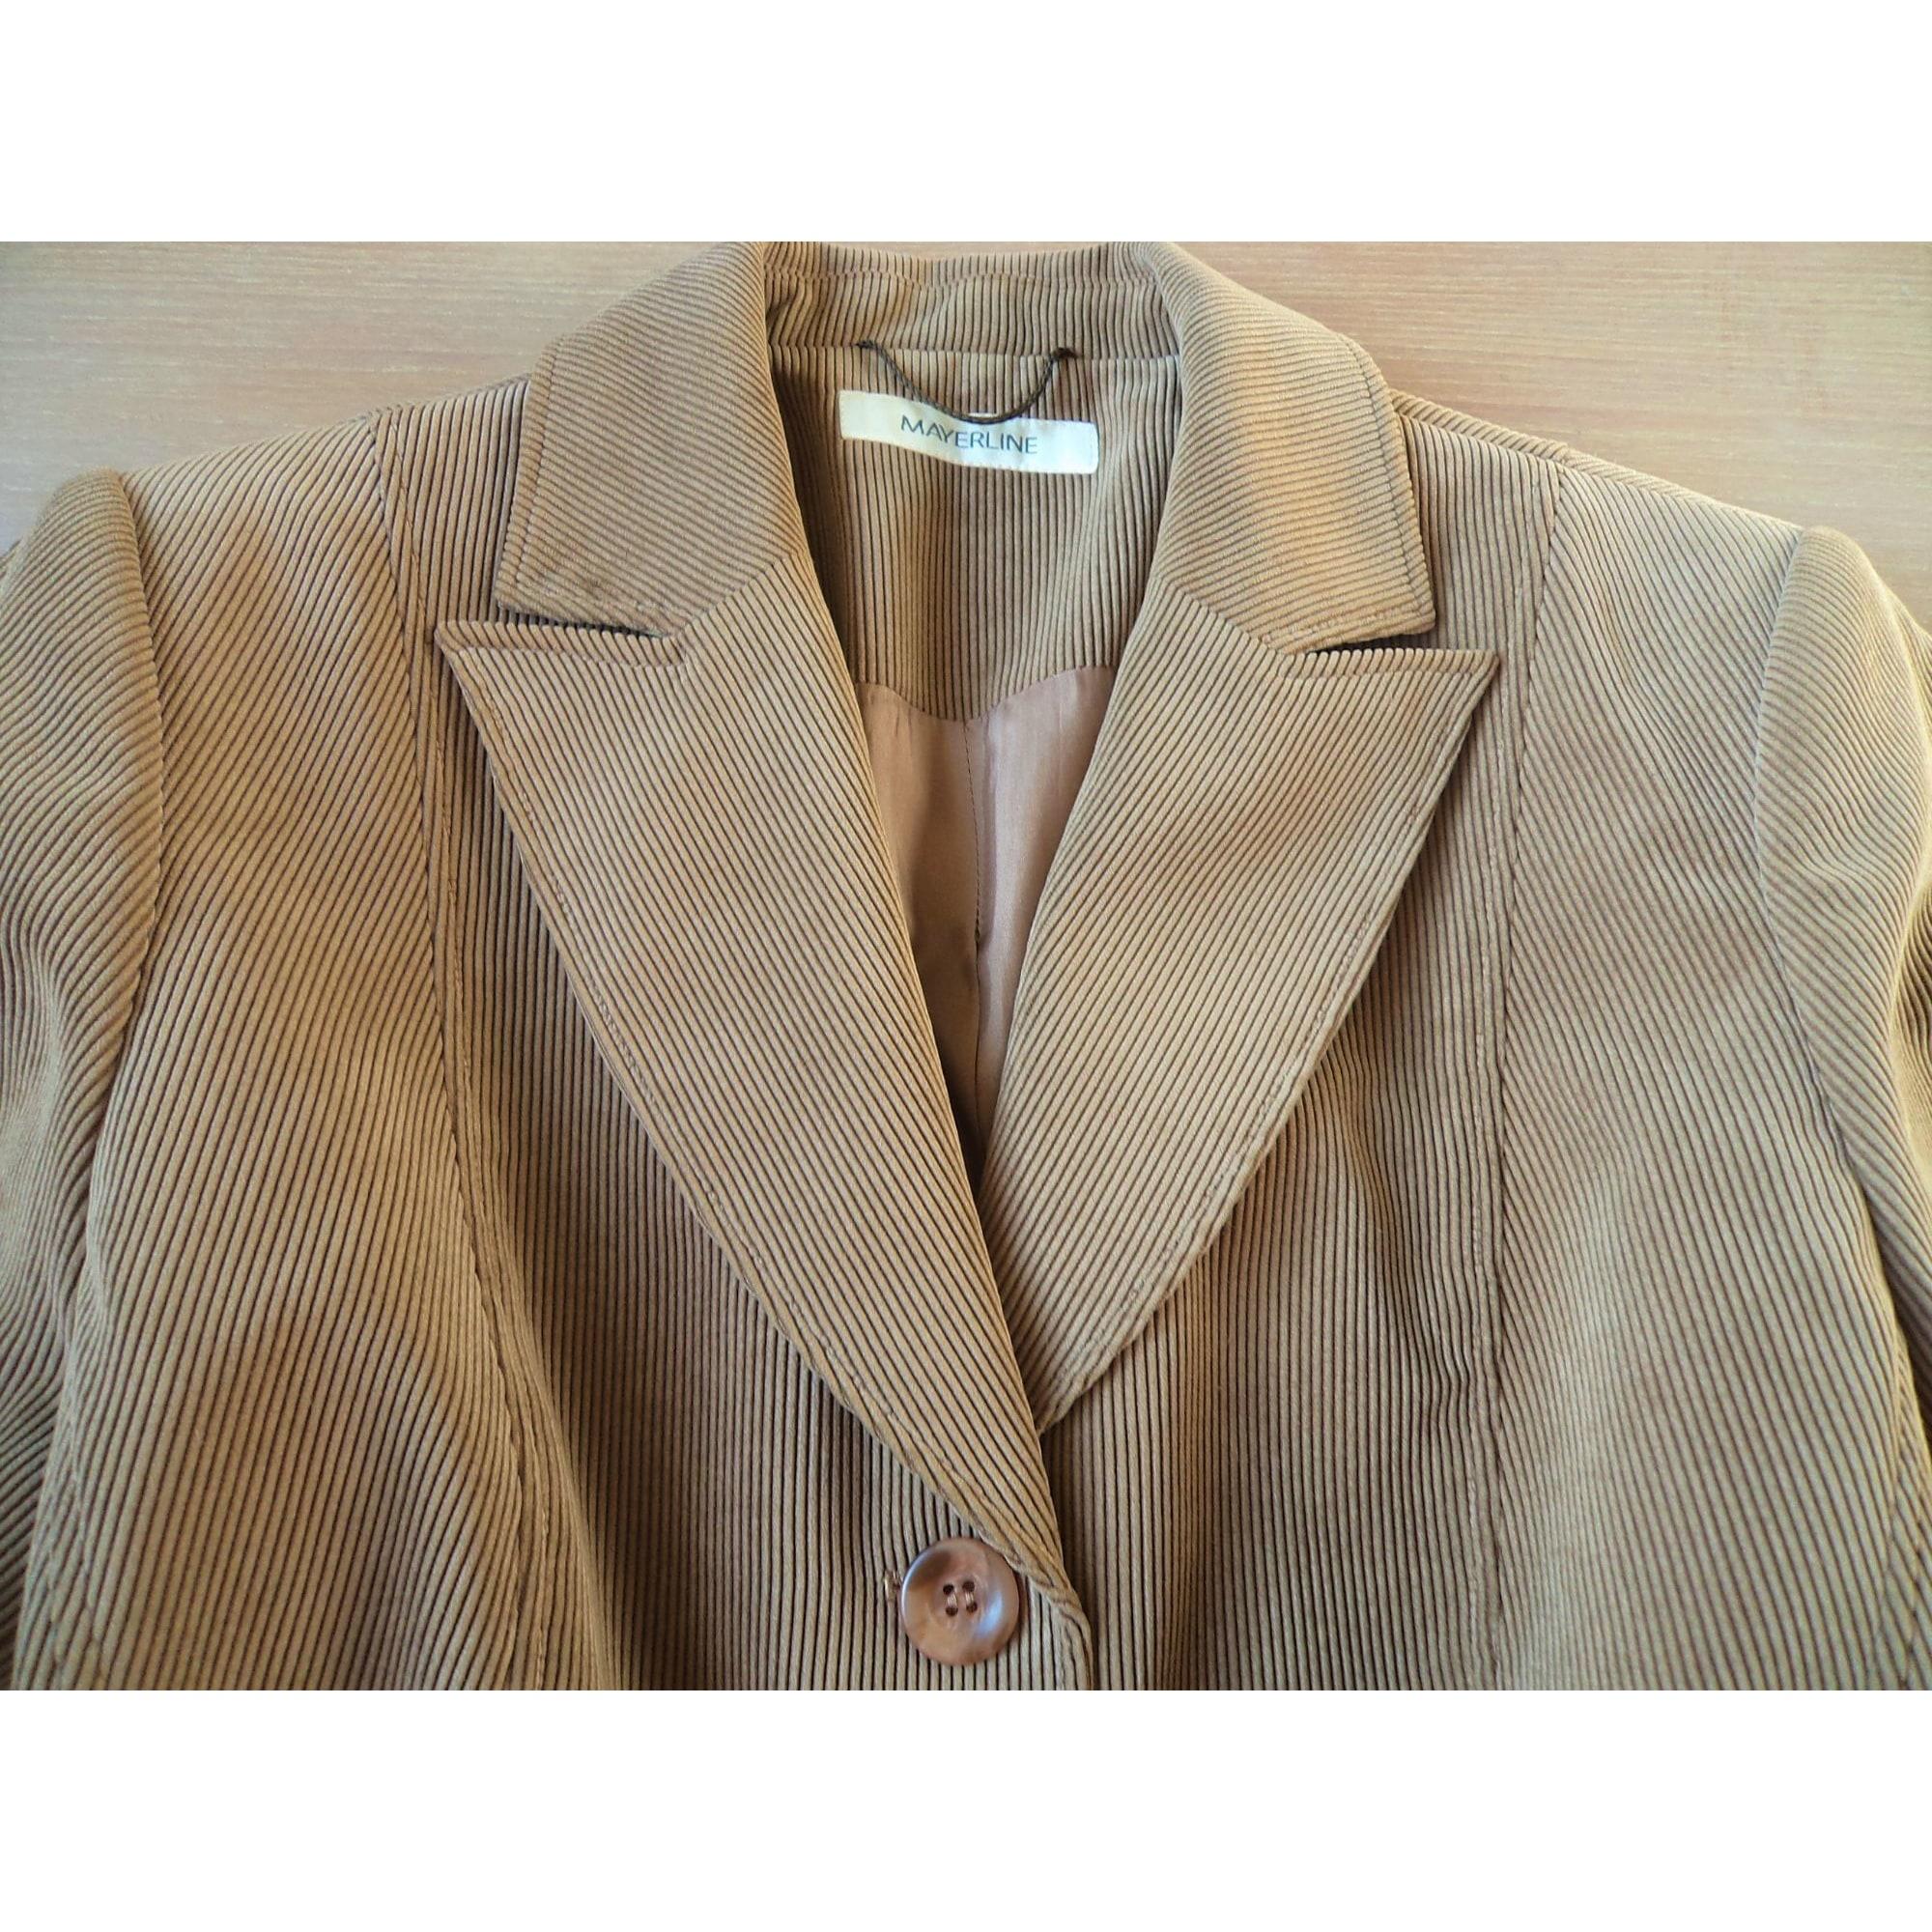 Blazer, veste tailleur MAYERLINE Beige, camel